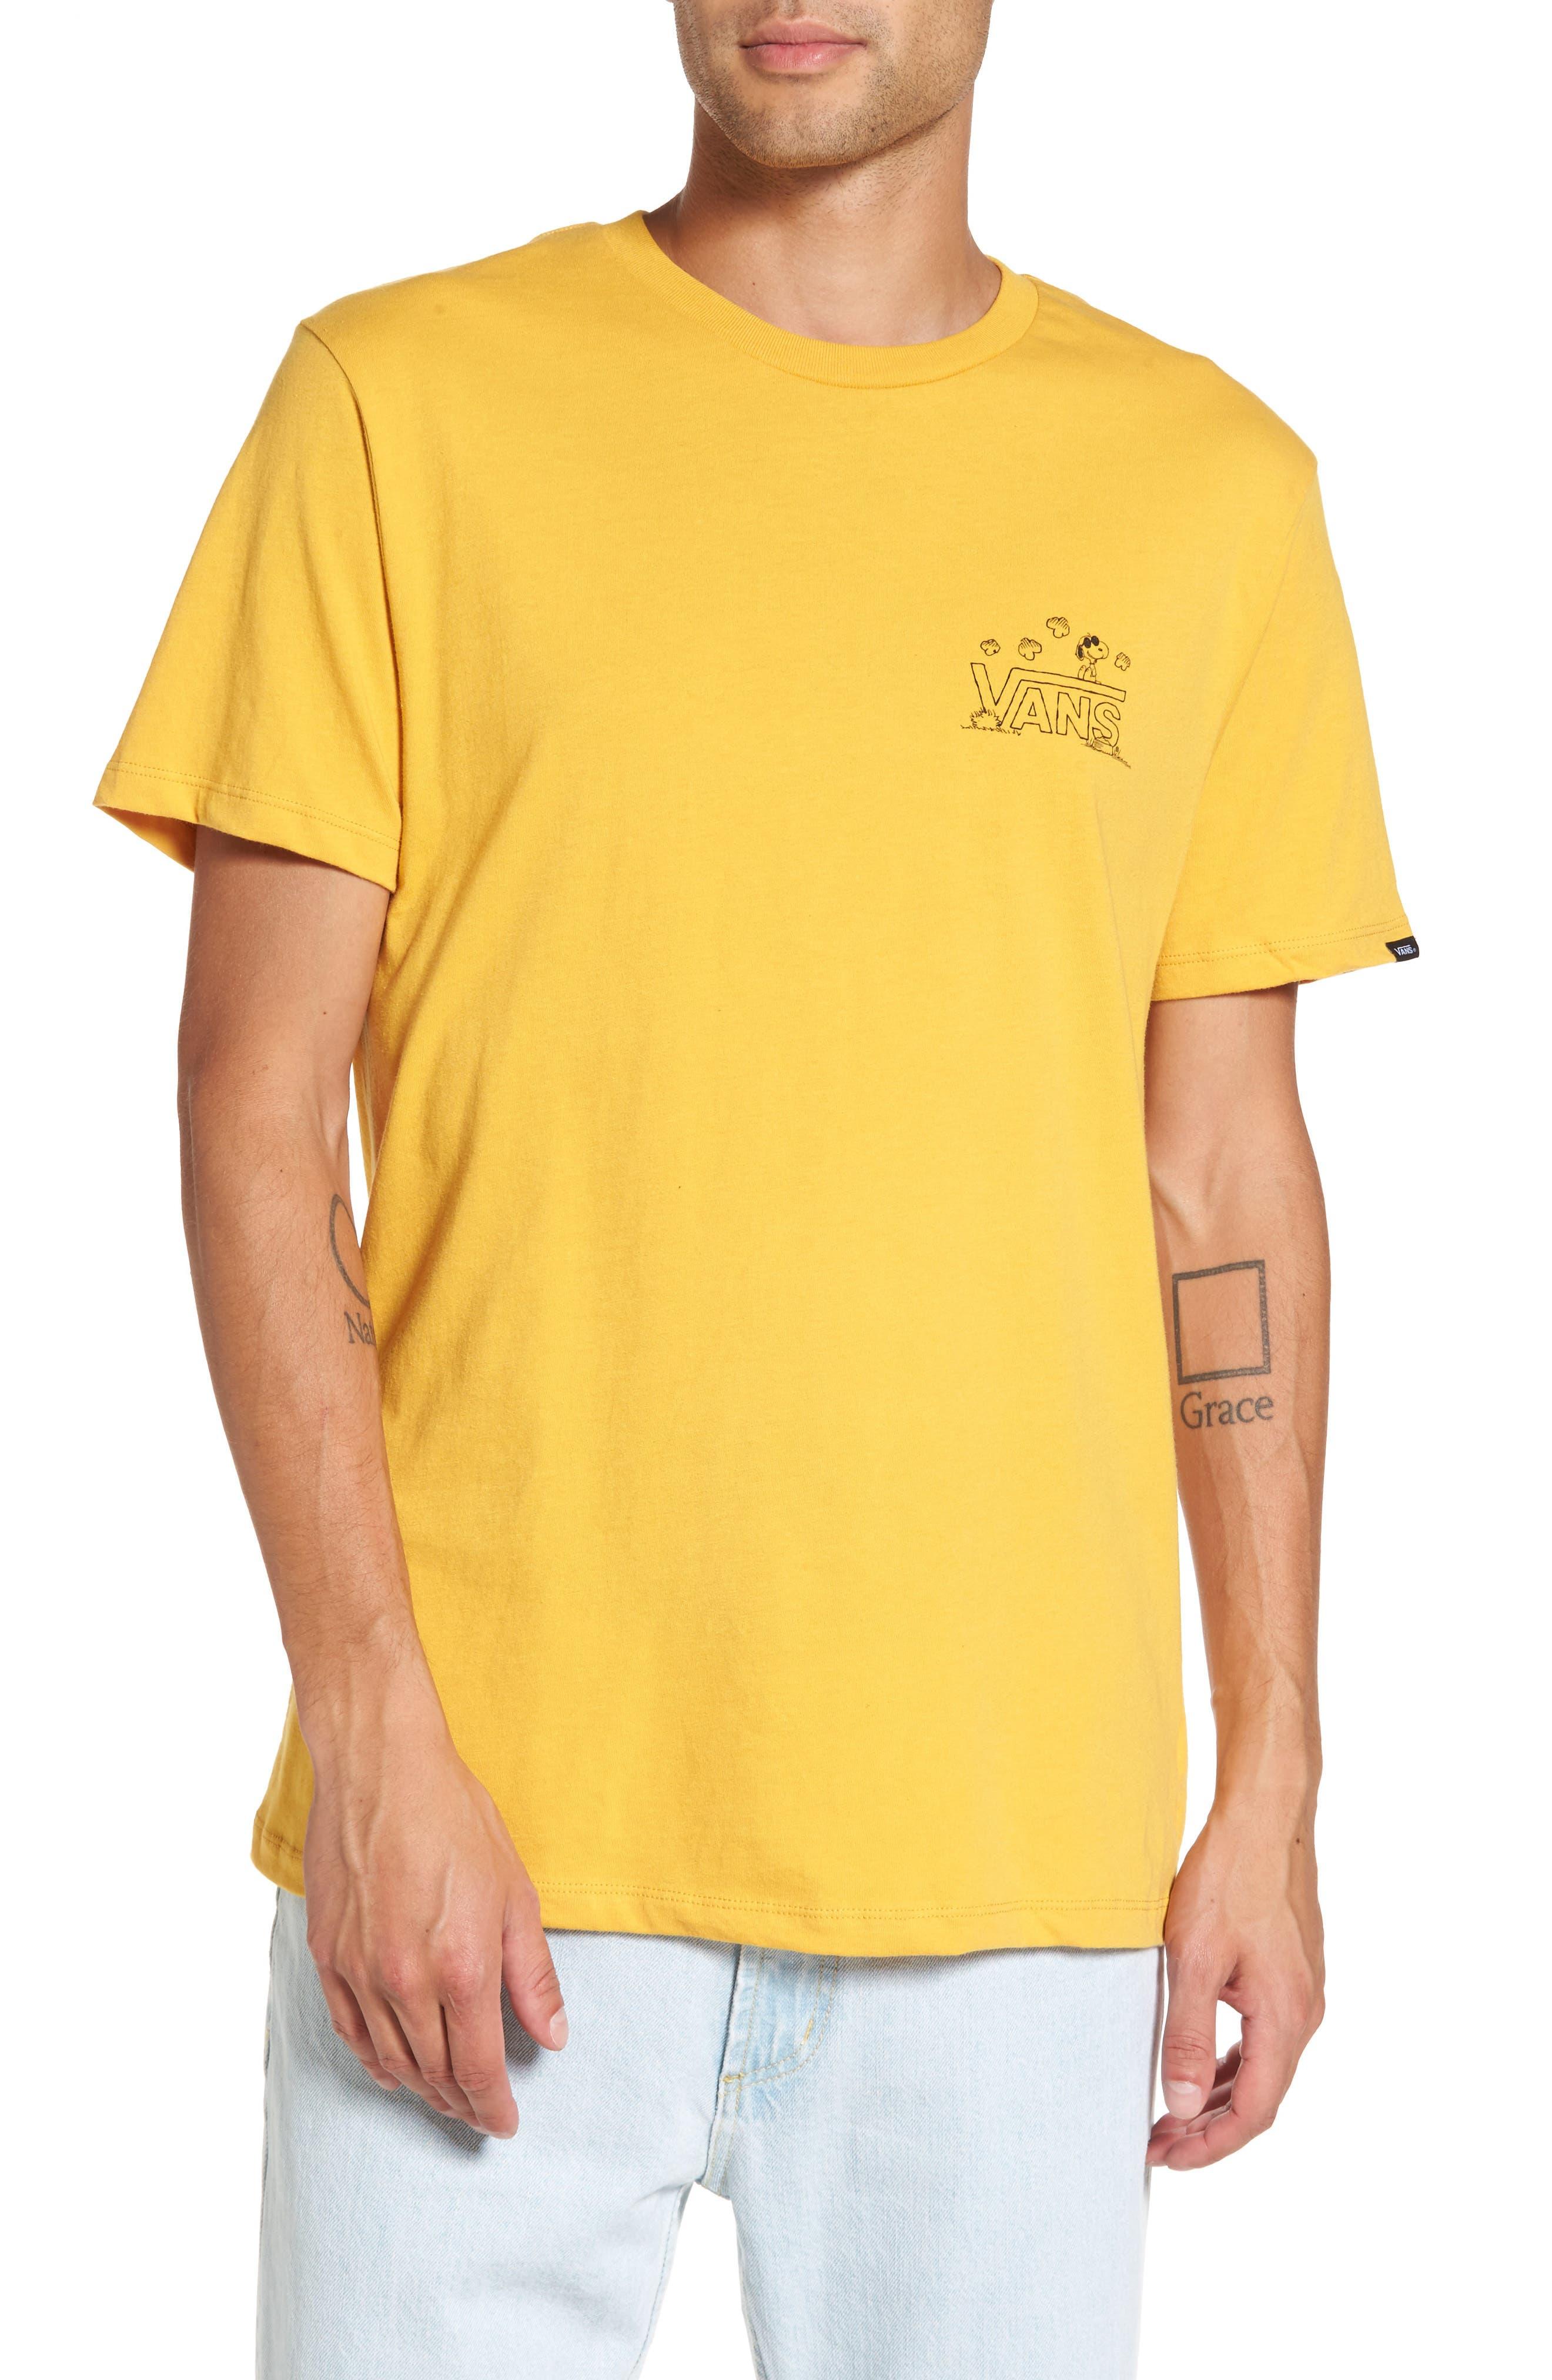 Vans x Peanuts Classic Snoopy T-Shirt